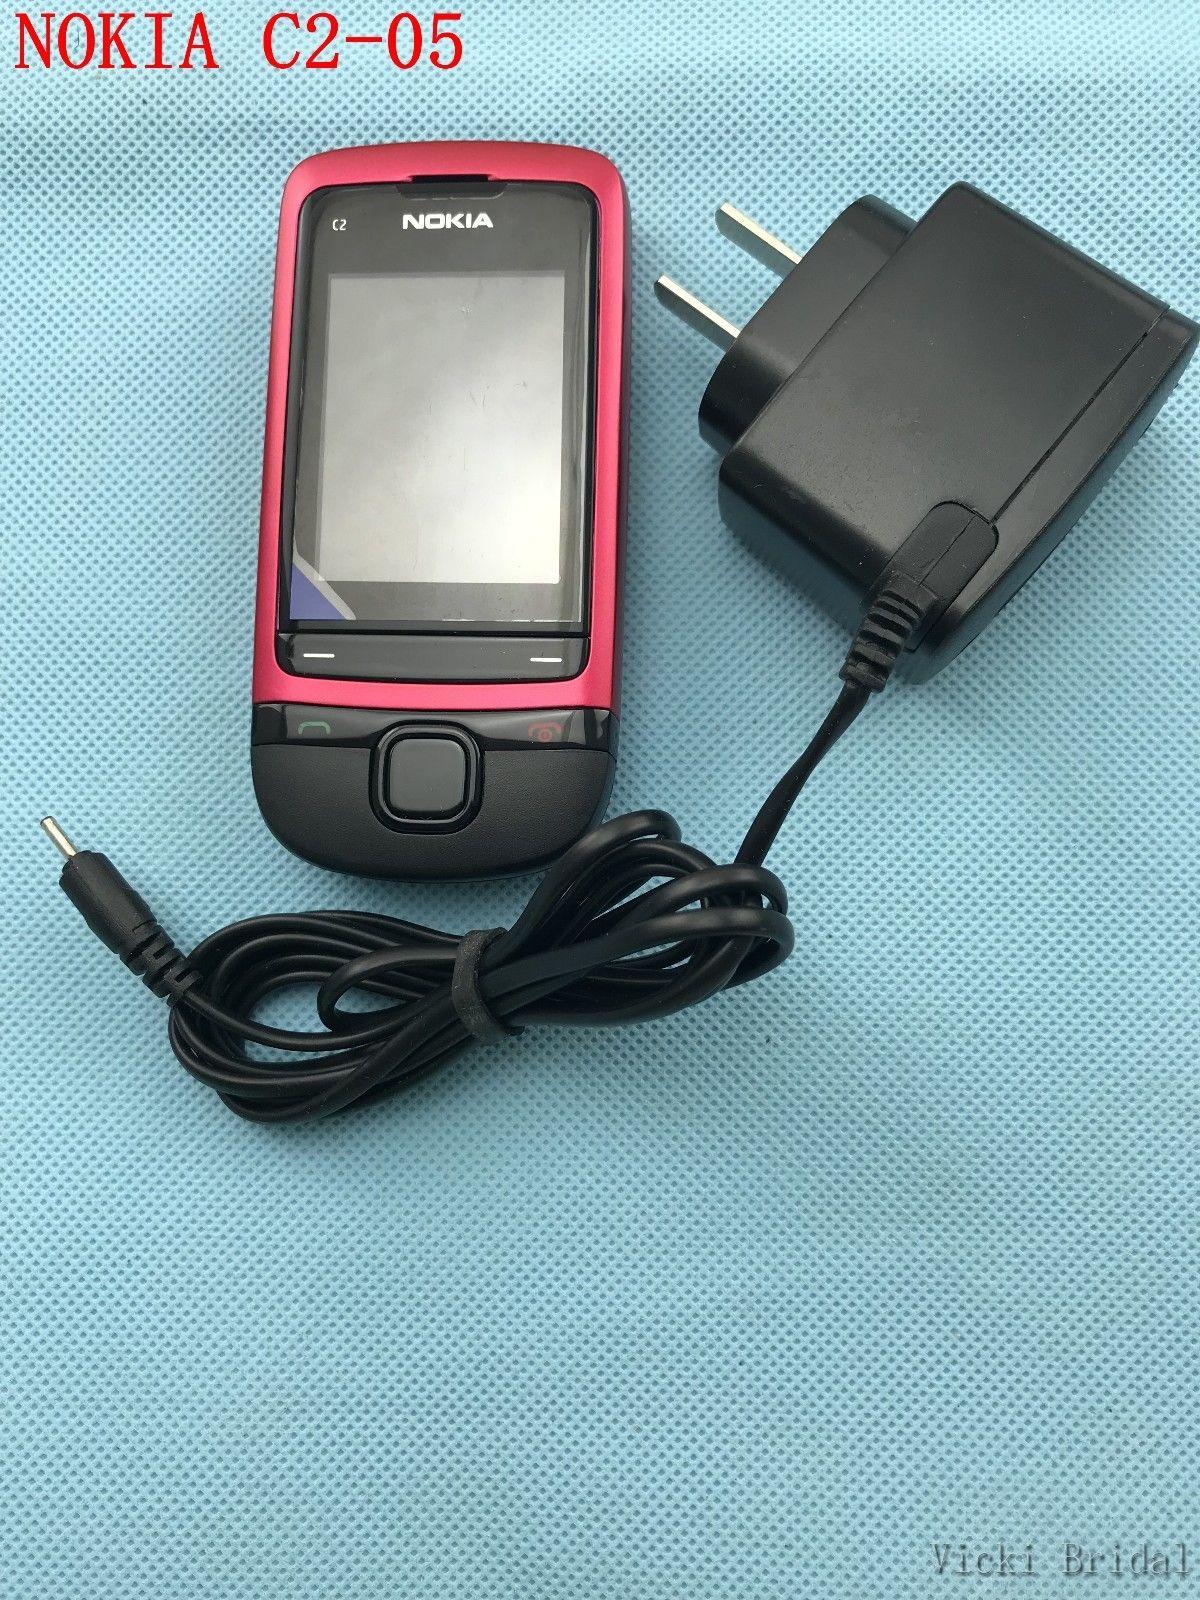 Refurbished phone Original Unlocked Nokia C2-05 slide cell phone Bluetooth phone black 3